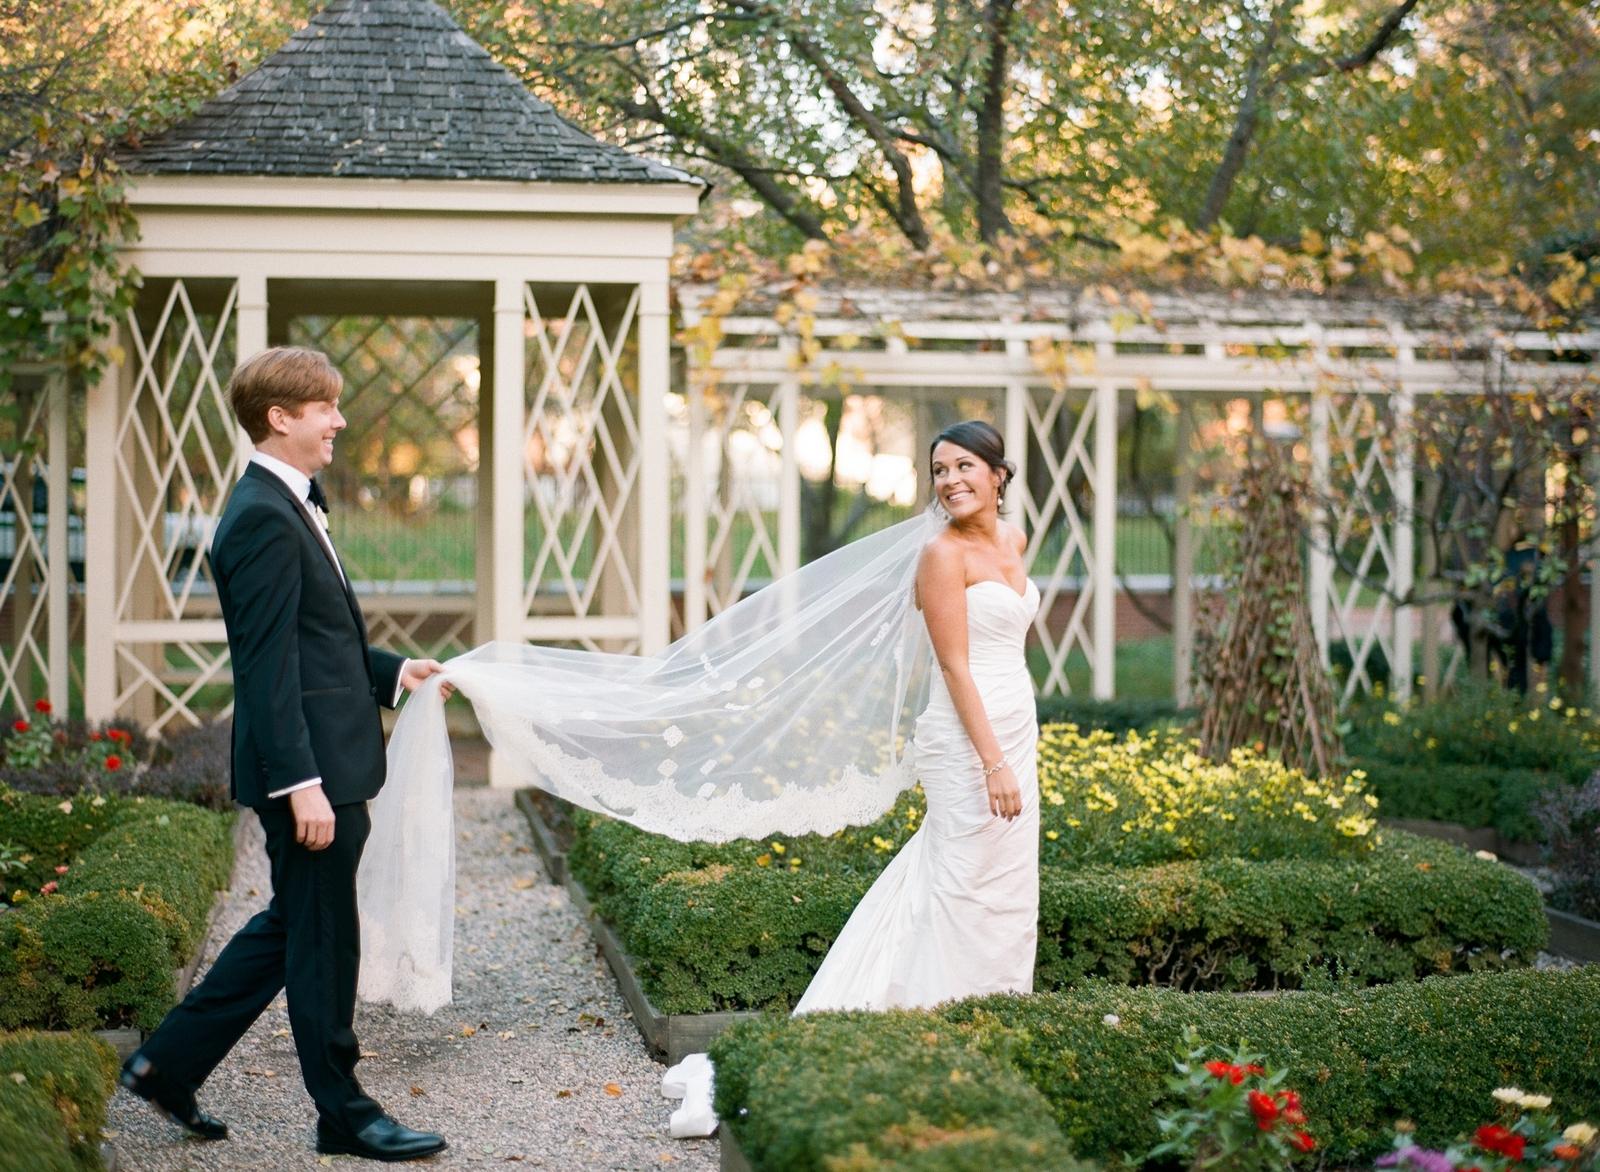 atrium at curtis center wedding photographer philadelphia wedding photographer shannon griffin_0002.jpg